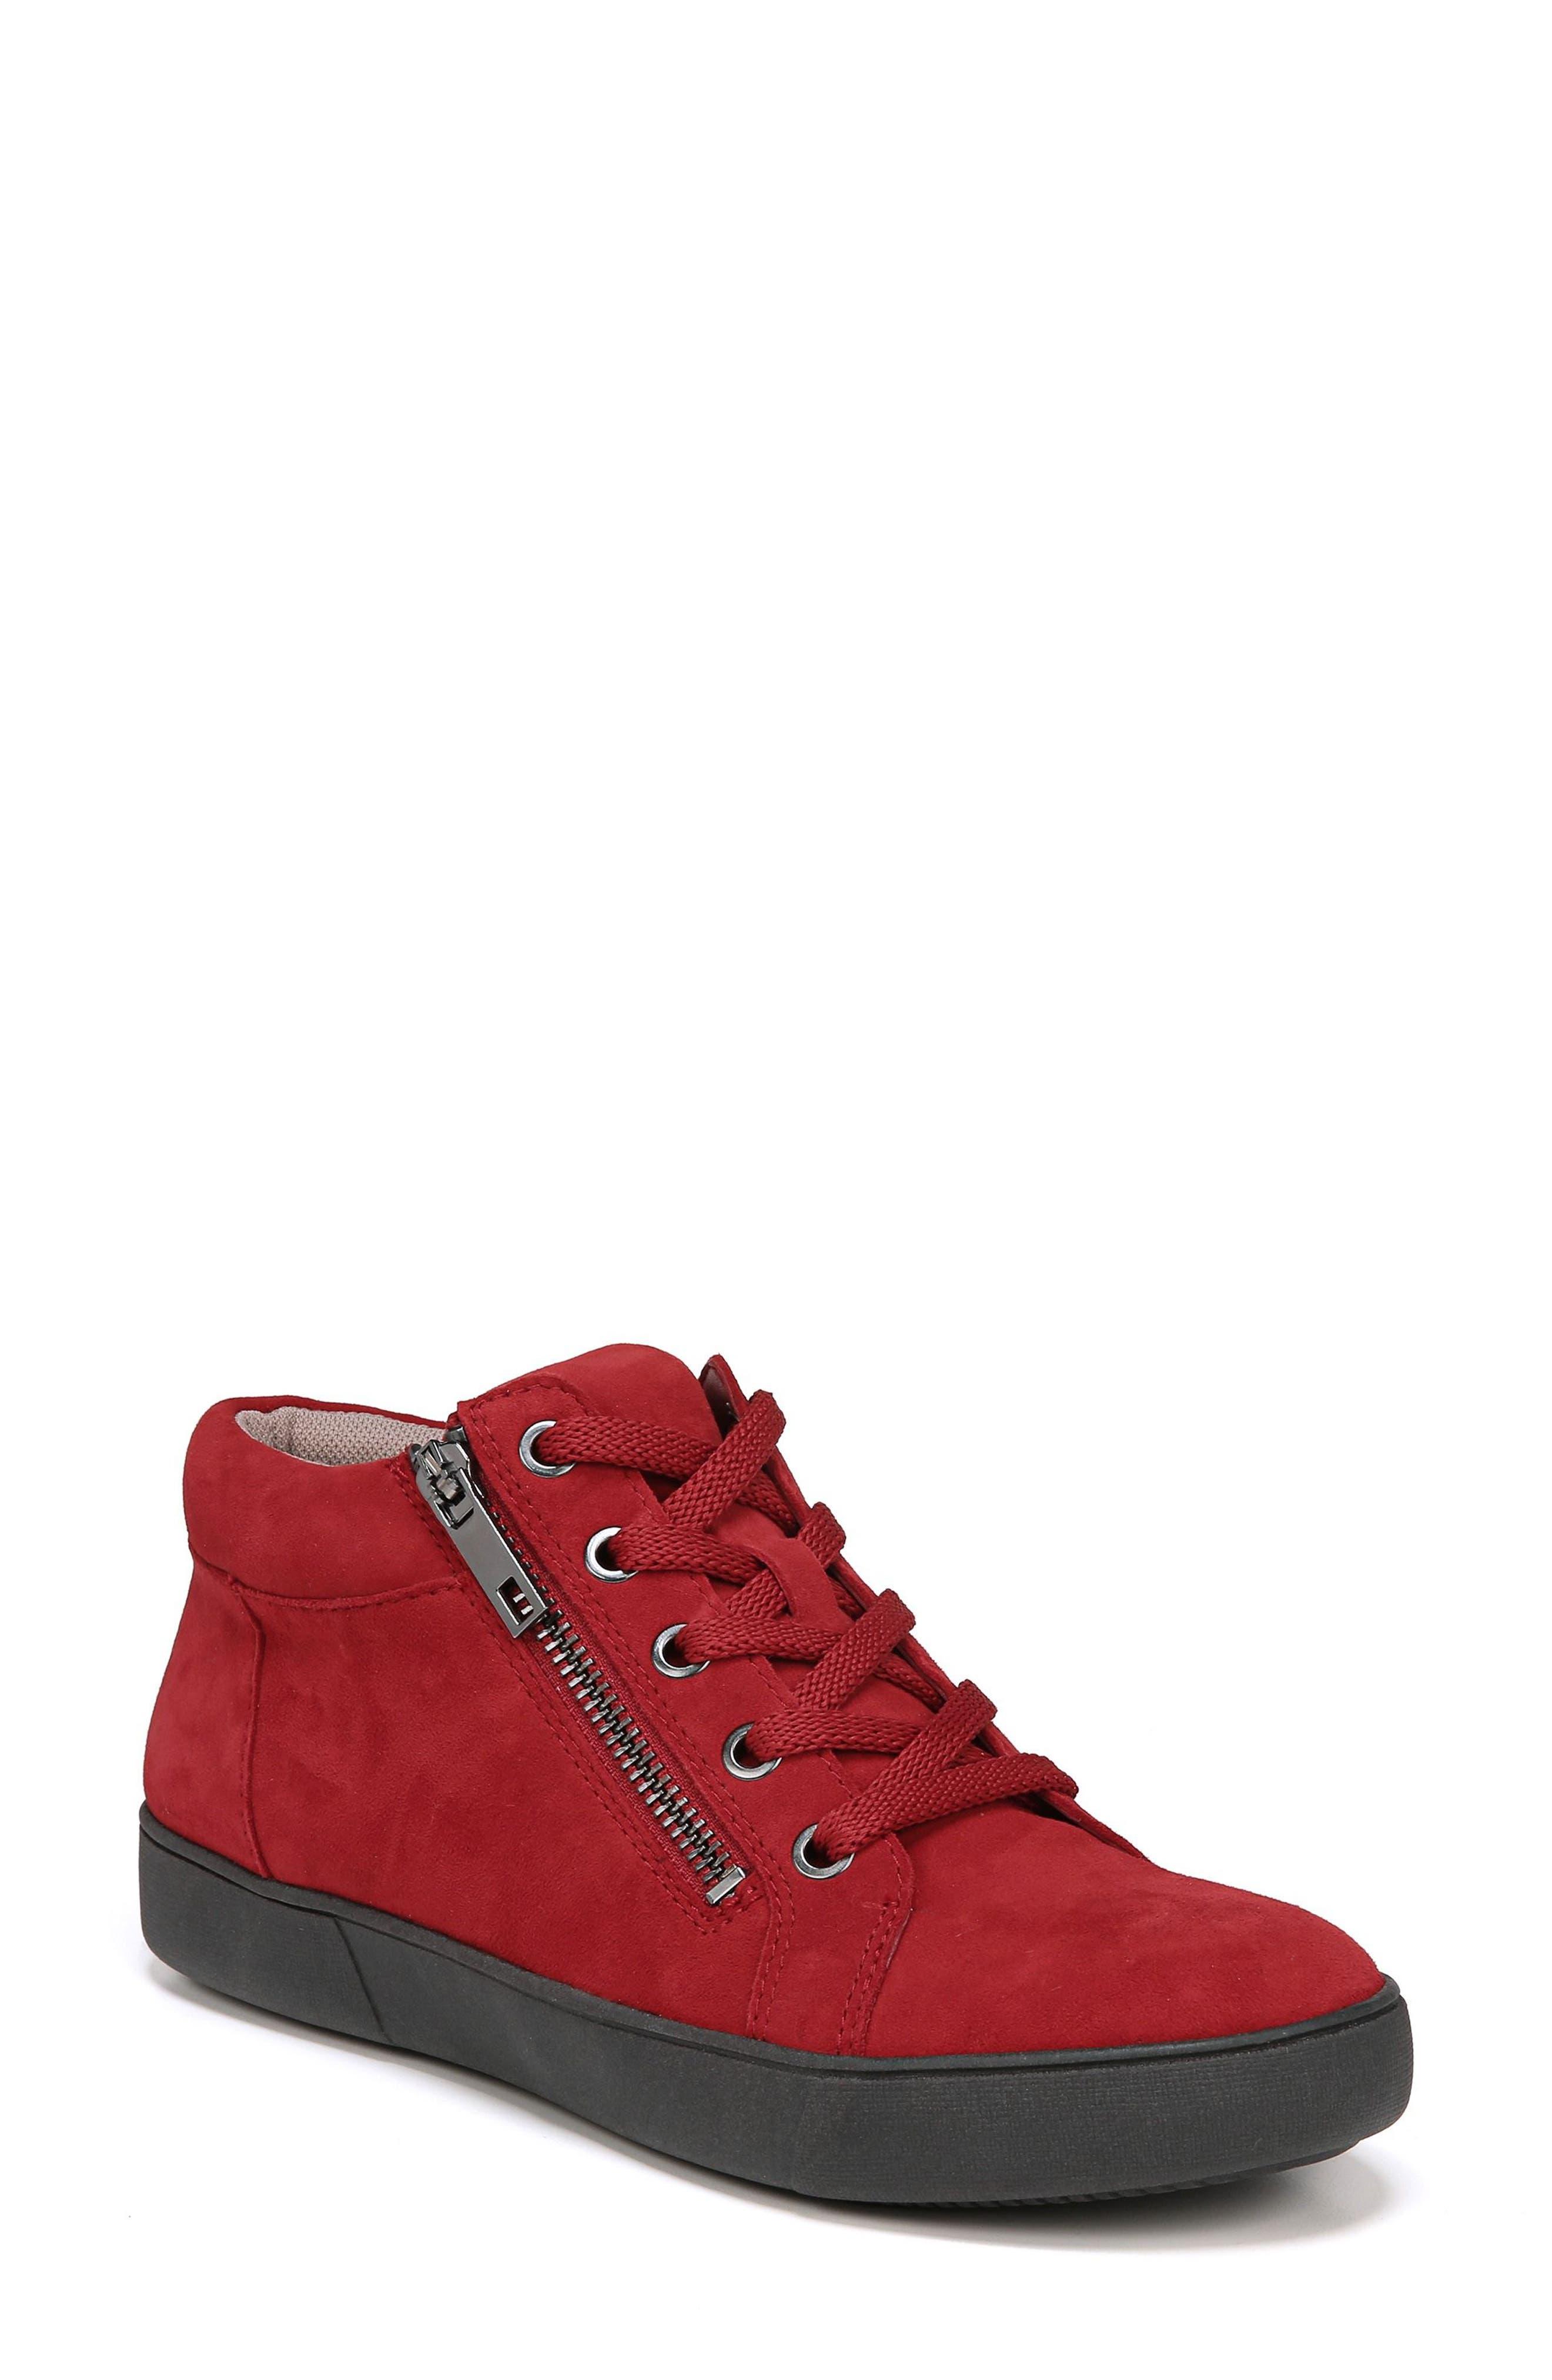 Motley Sneaker,                             Main thumbnail 1, color,                             Hot Sauce Suede